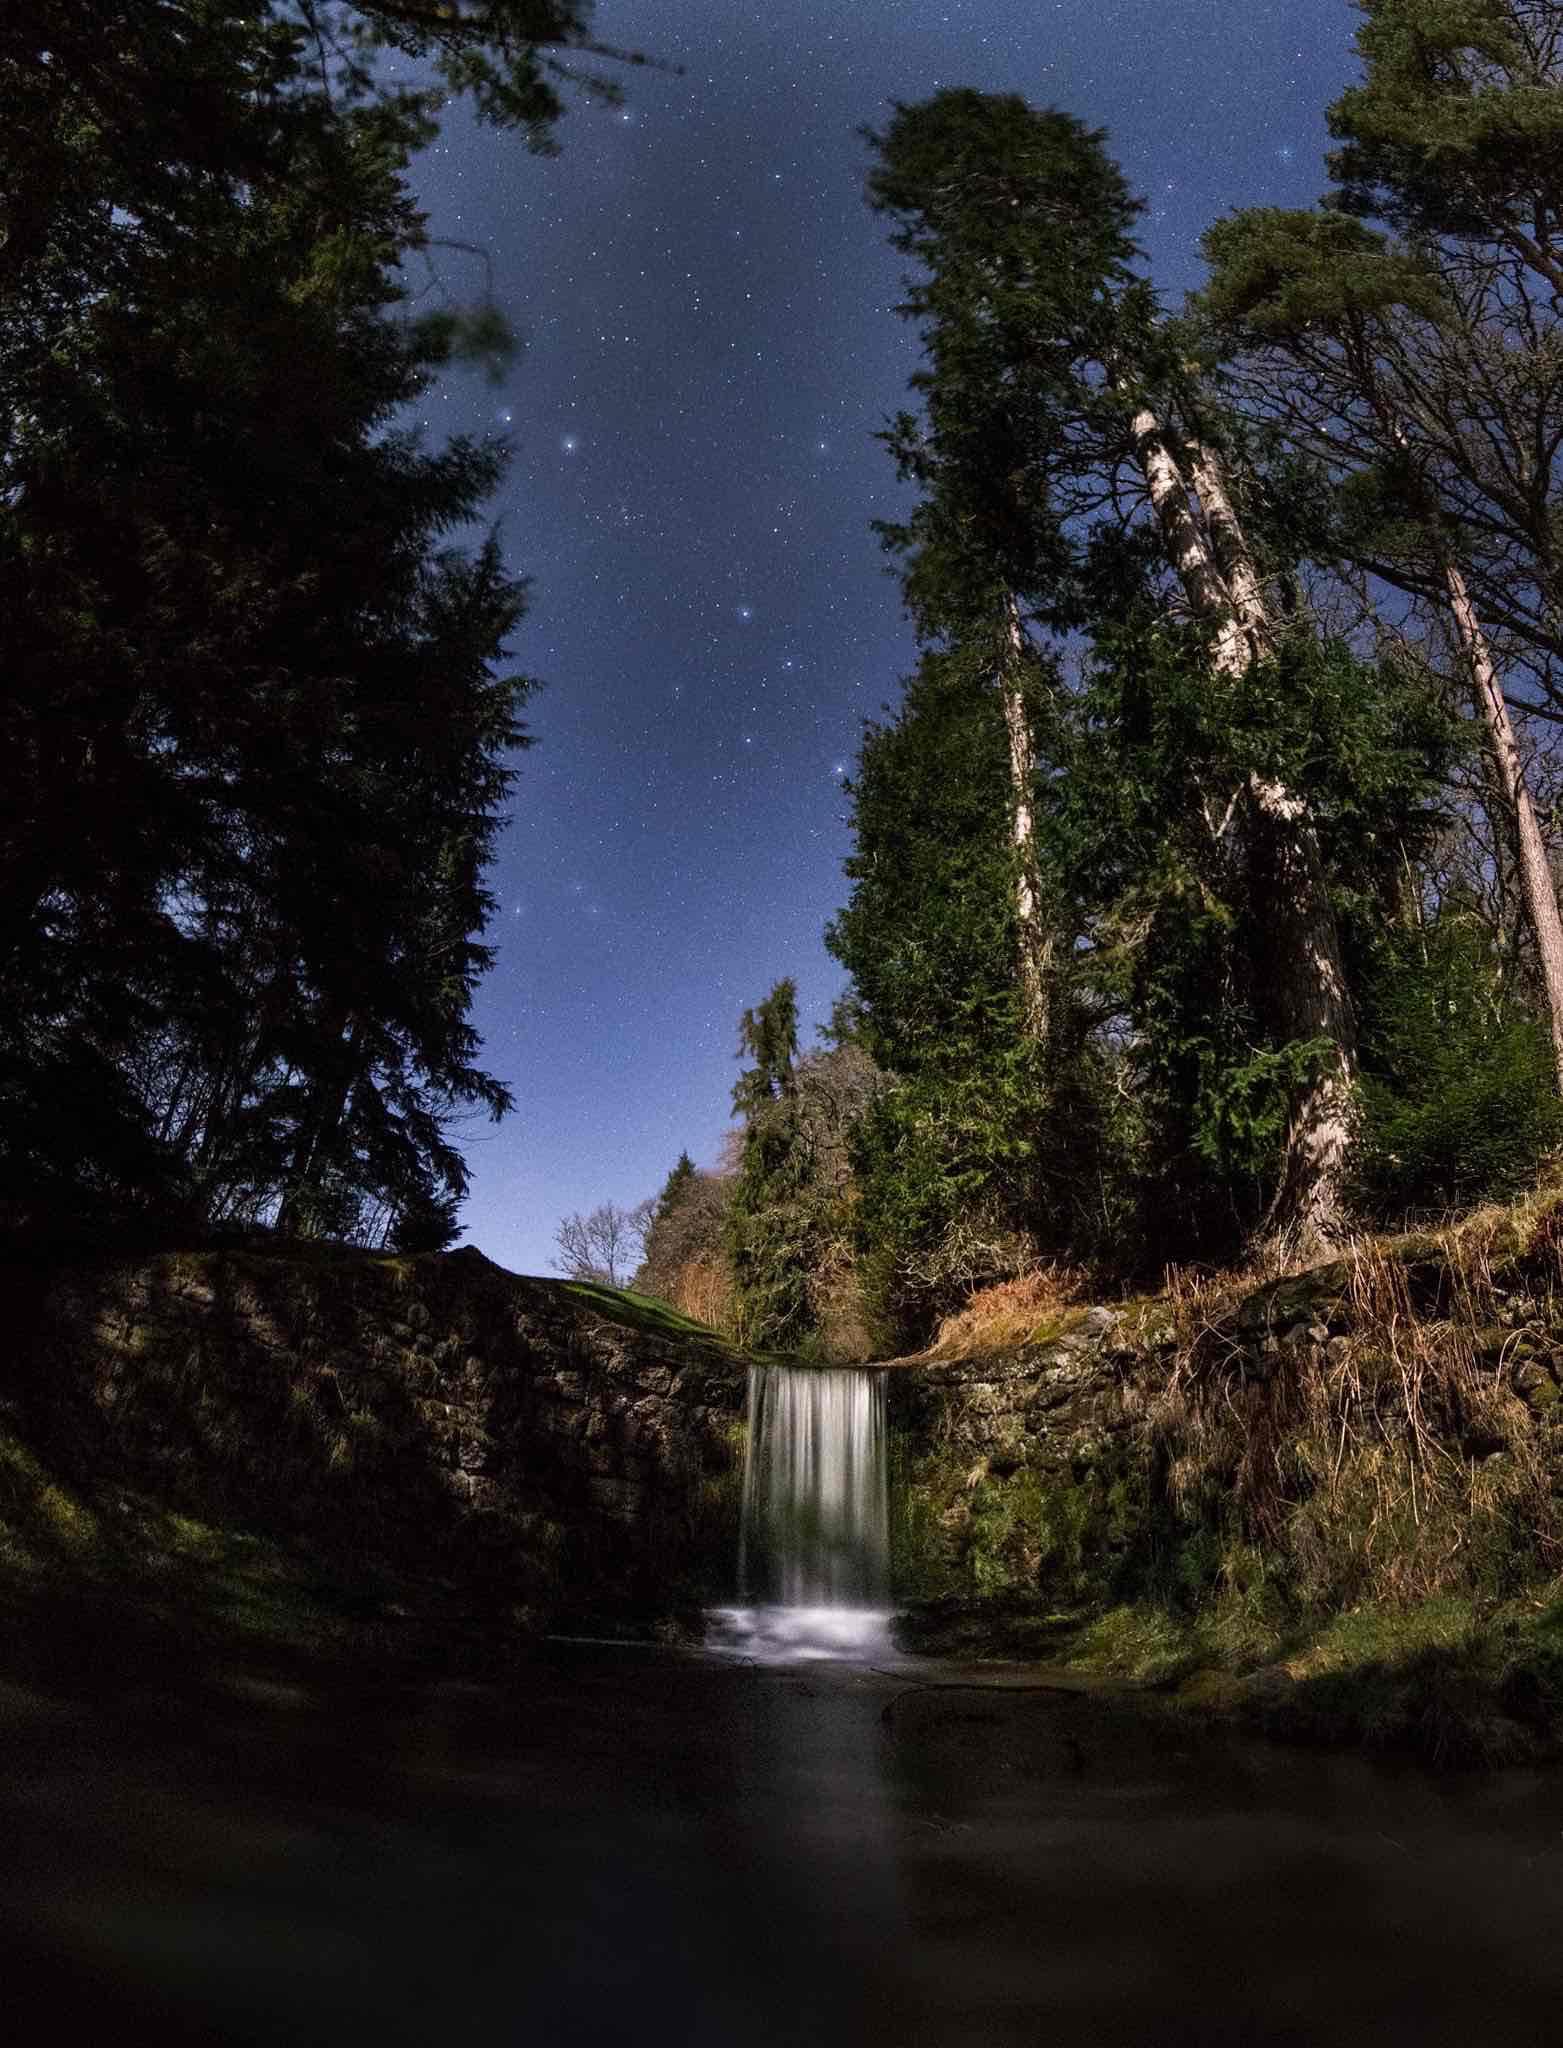 Fondos de pantalla hd de paisajes y naturaleza 5